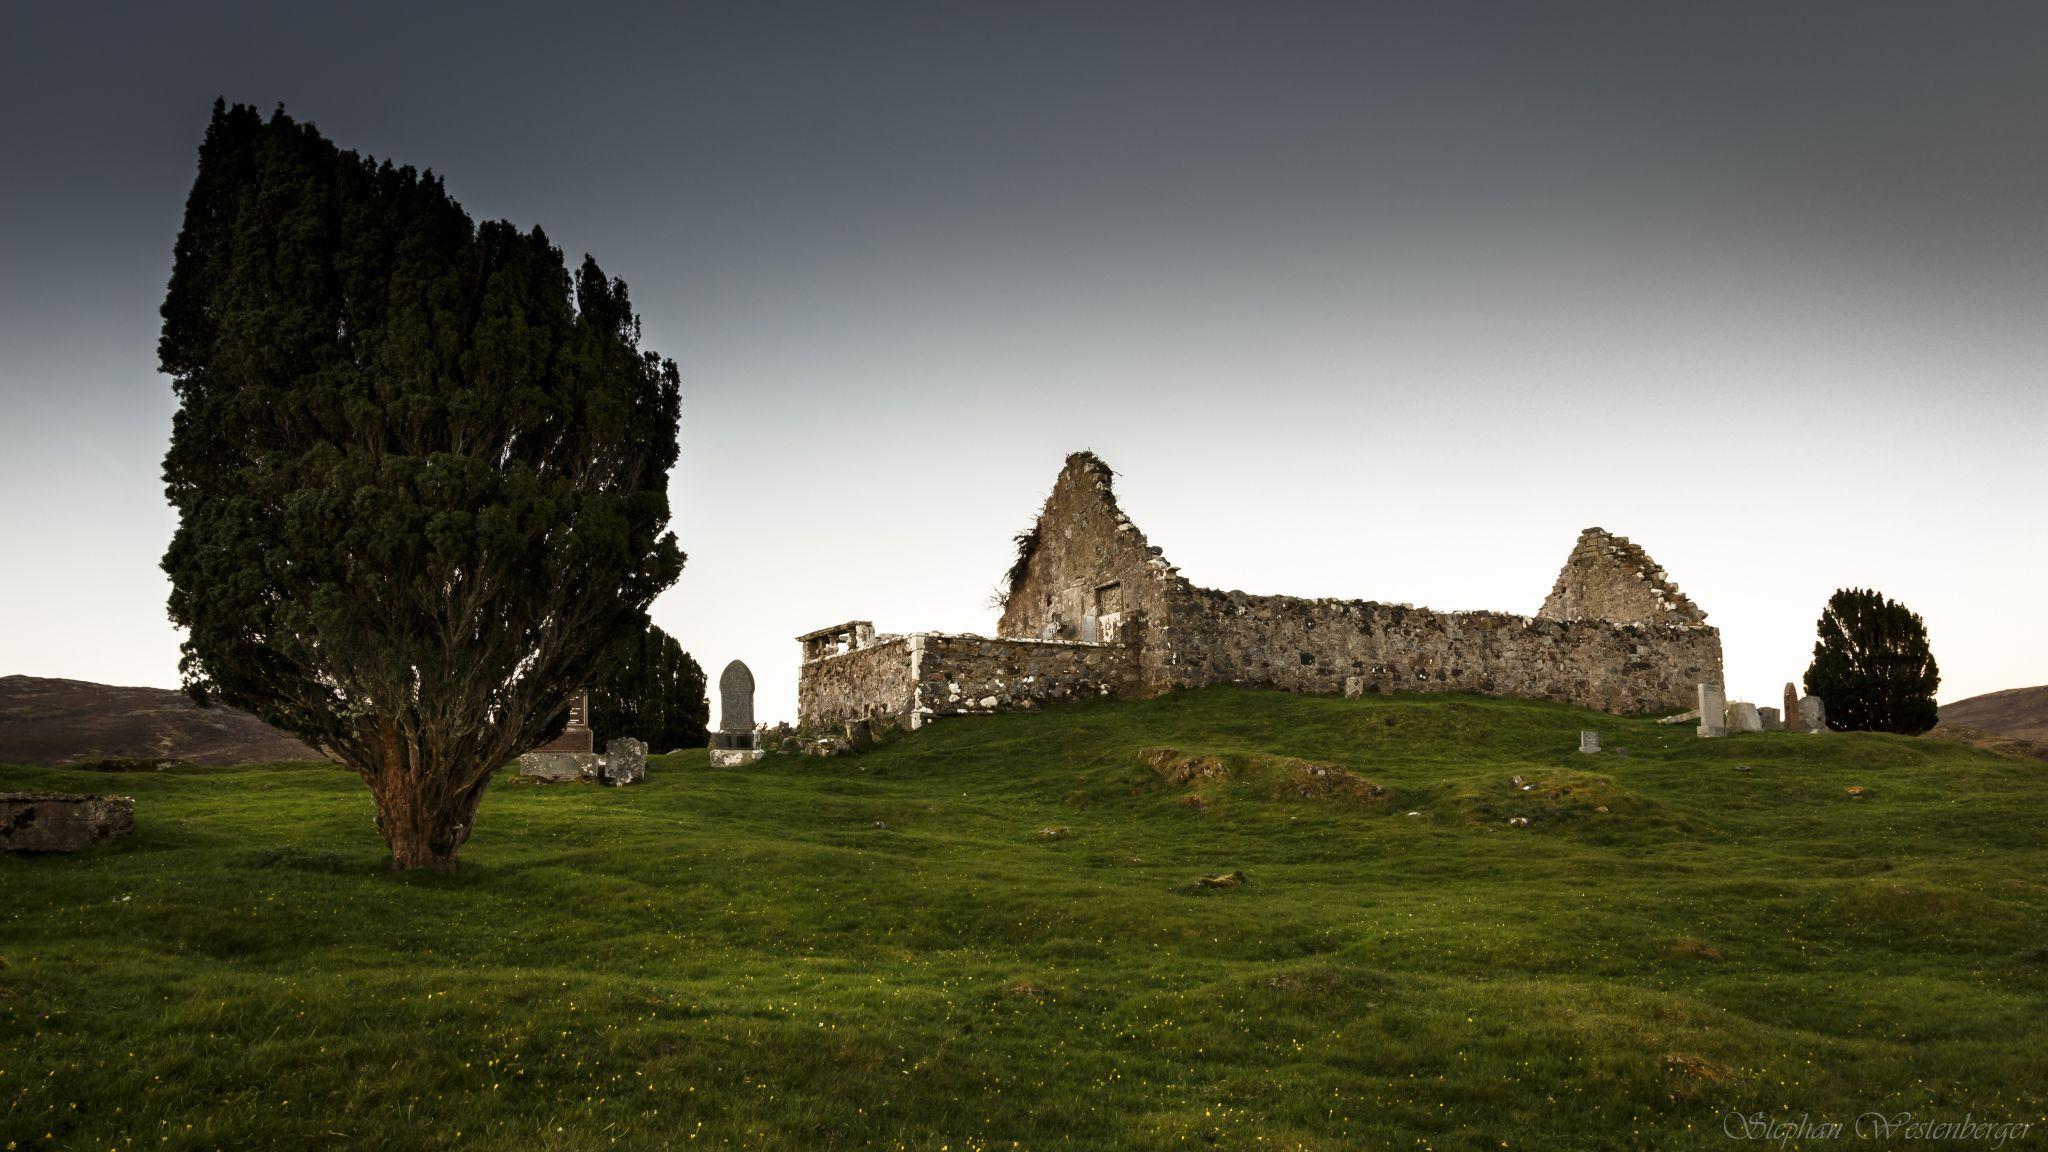 Cill Chriosd Graveyard, United Kingdom